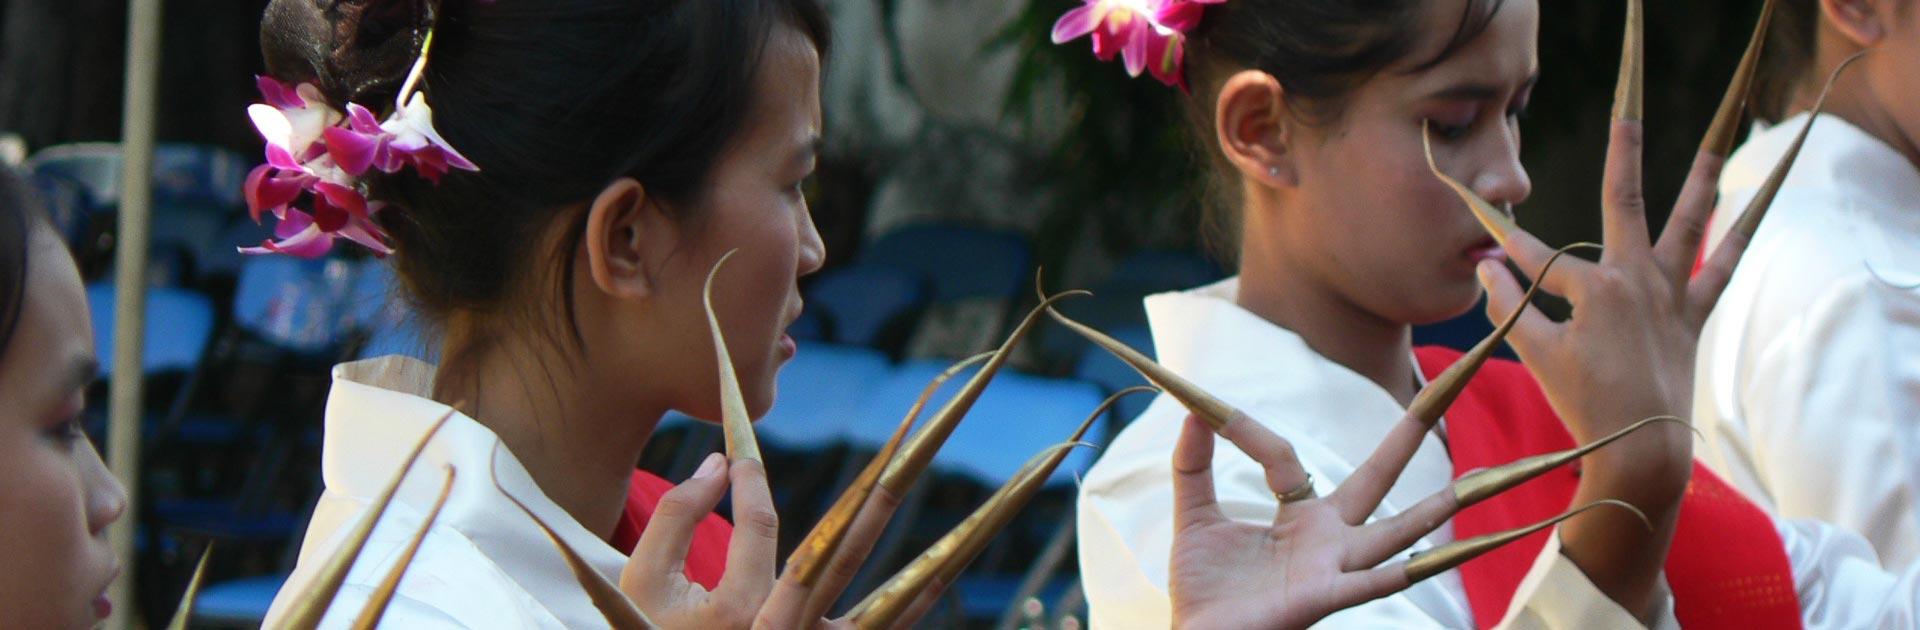 KHTH Siem Reap Triángulo de Oro y Phuket 15 días 2